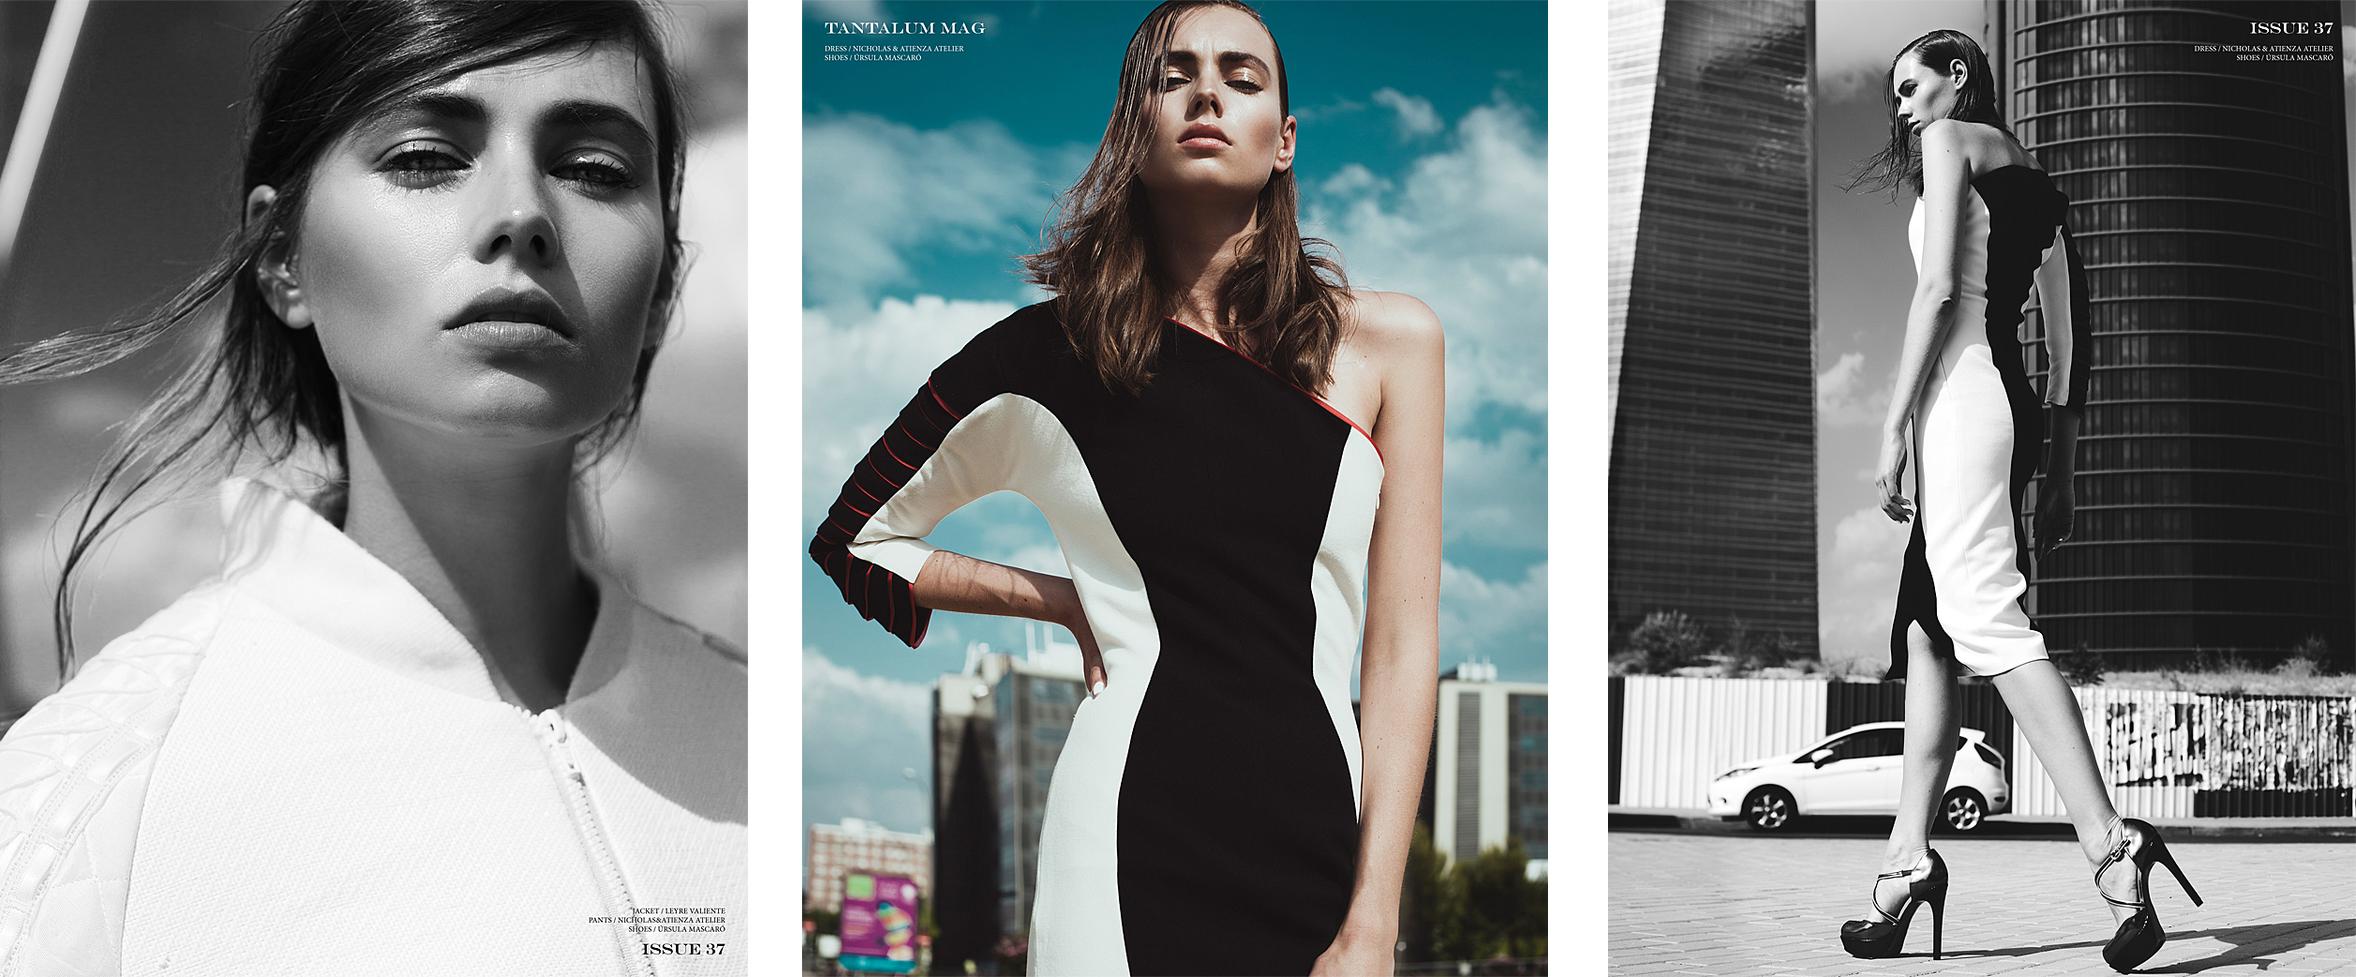 tantalum magazine sept 2014